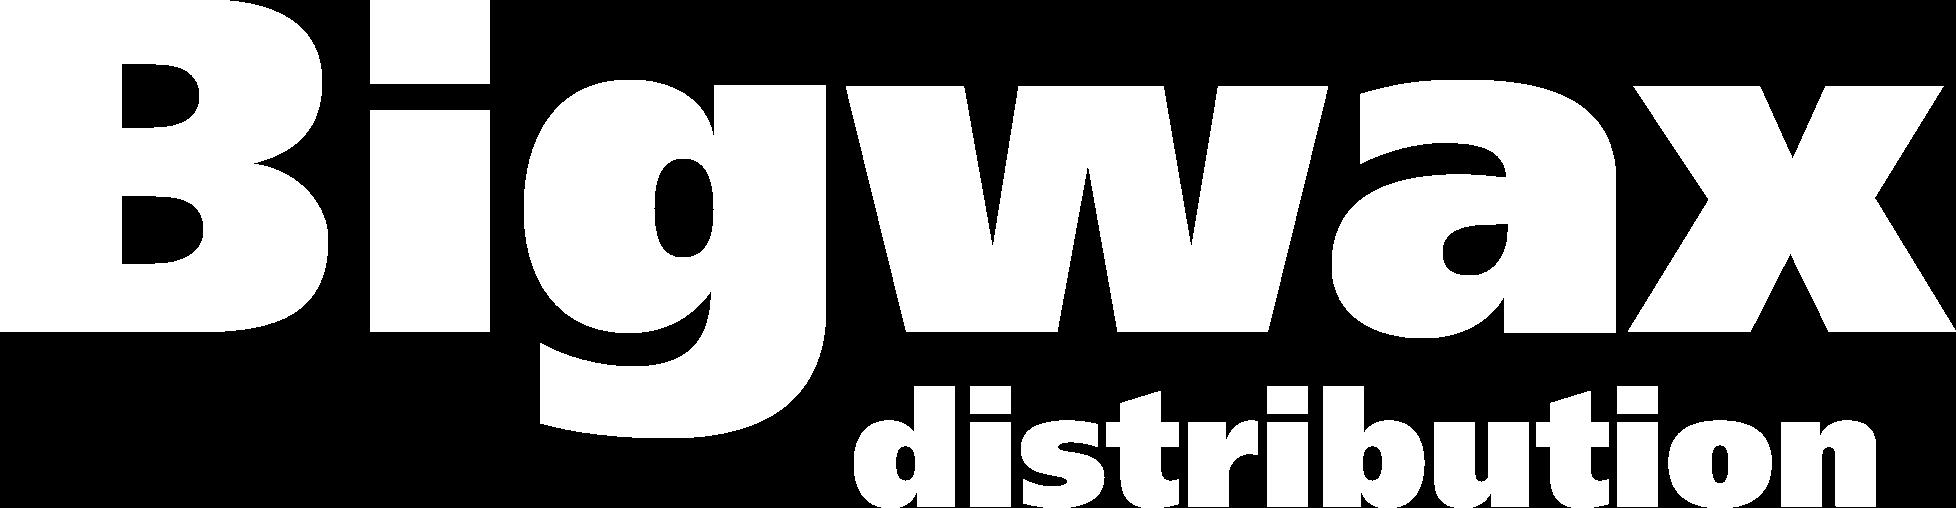 Bigwax_Distrib_logo